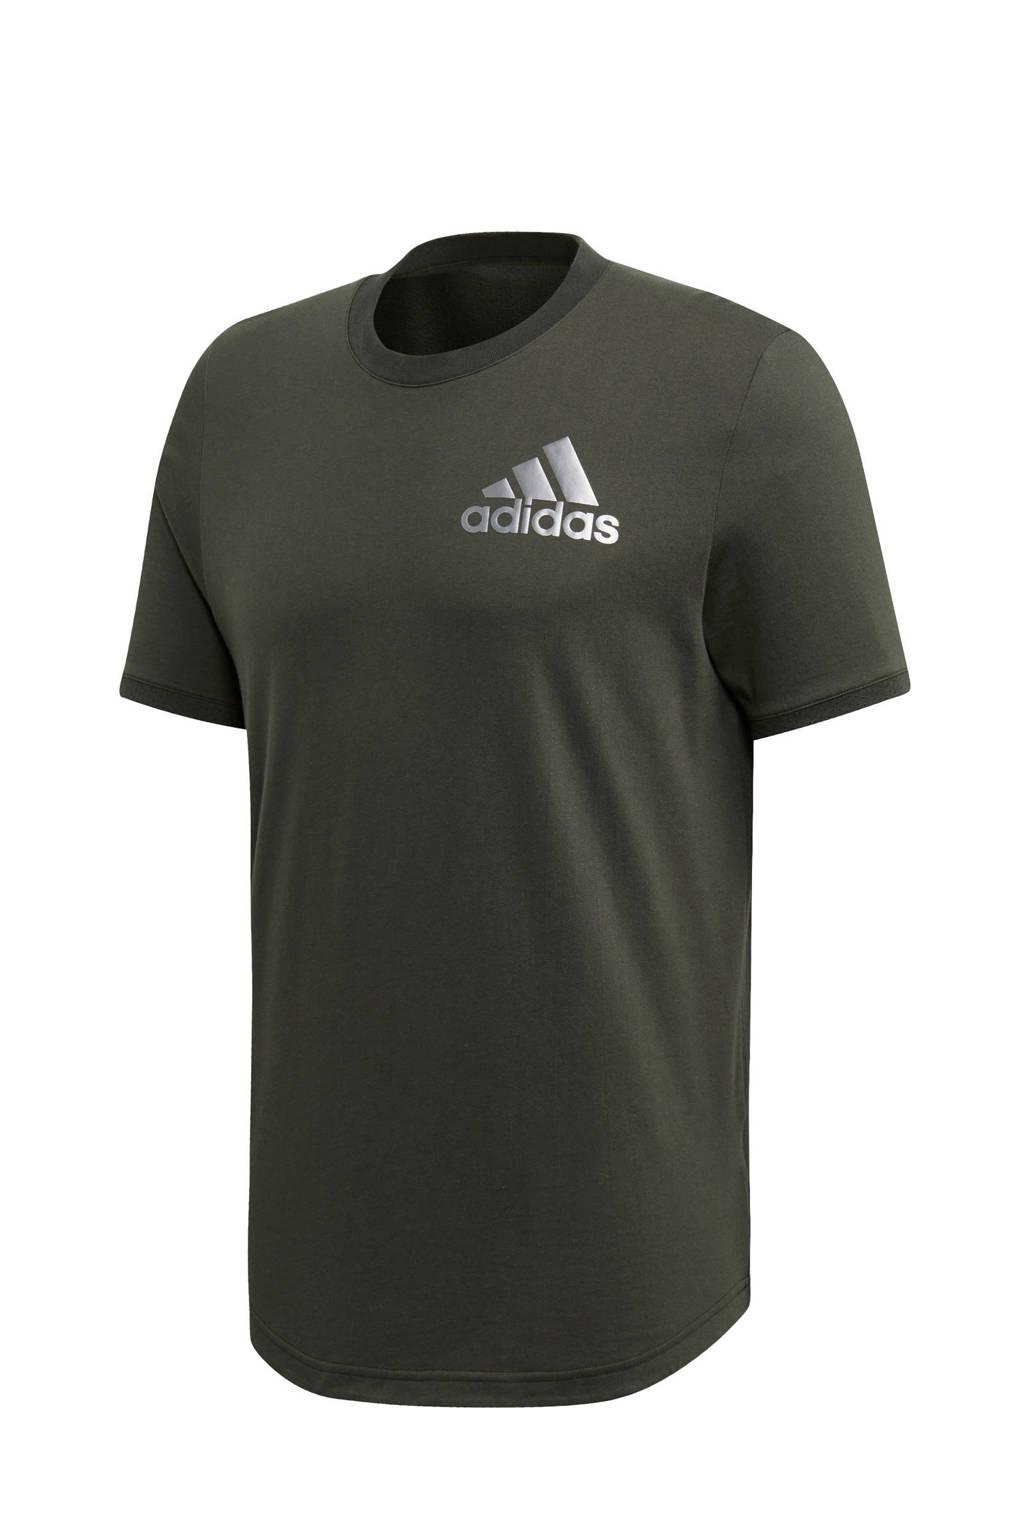 adidas performance   sport T-shirt antraciet, Antraciet